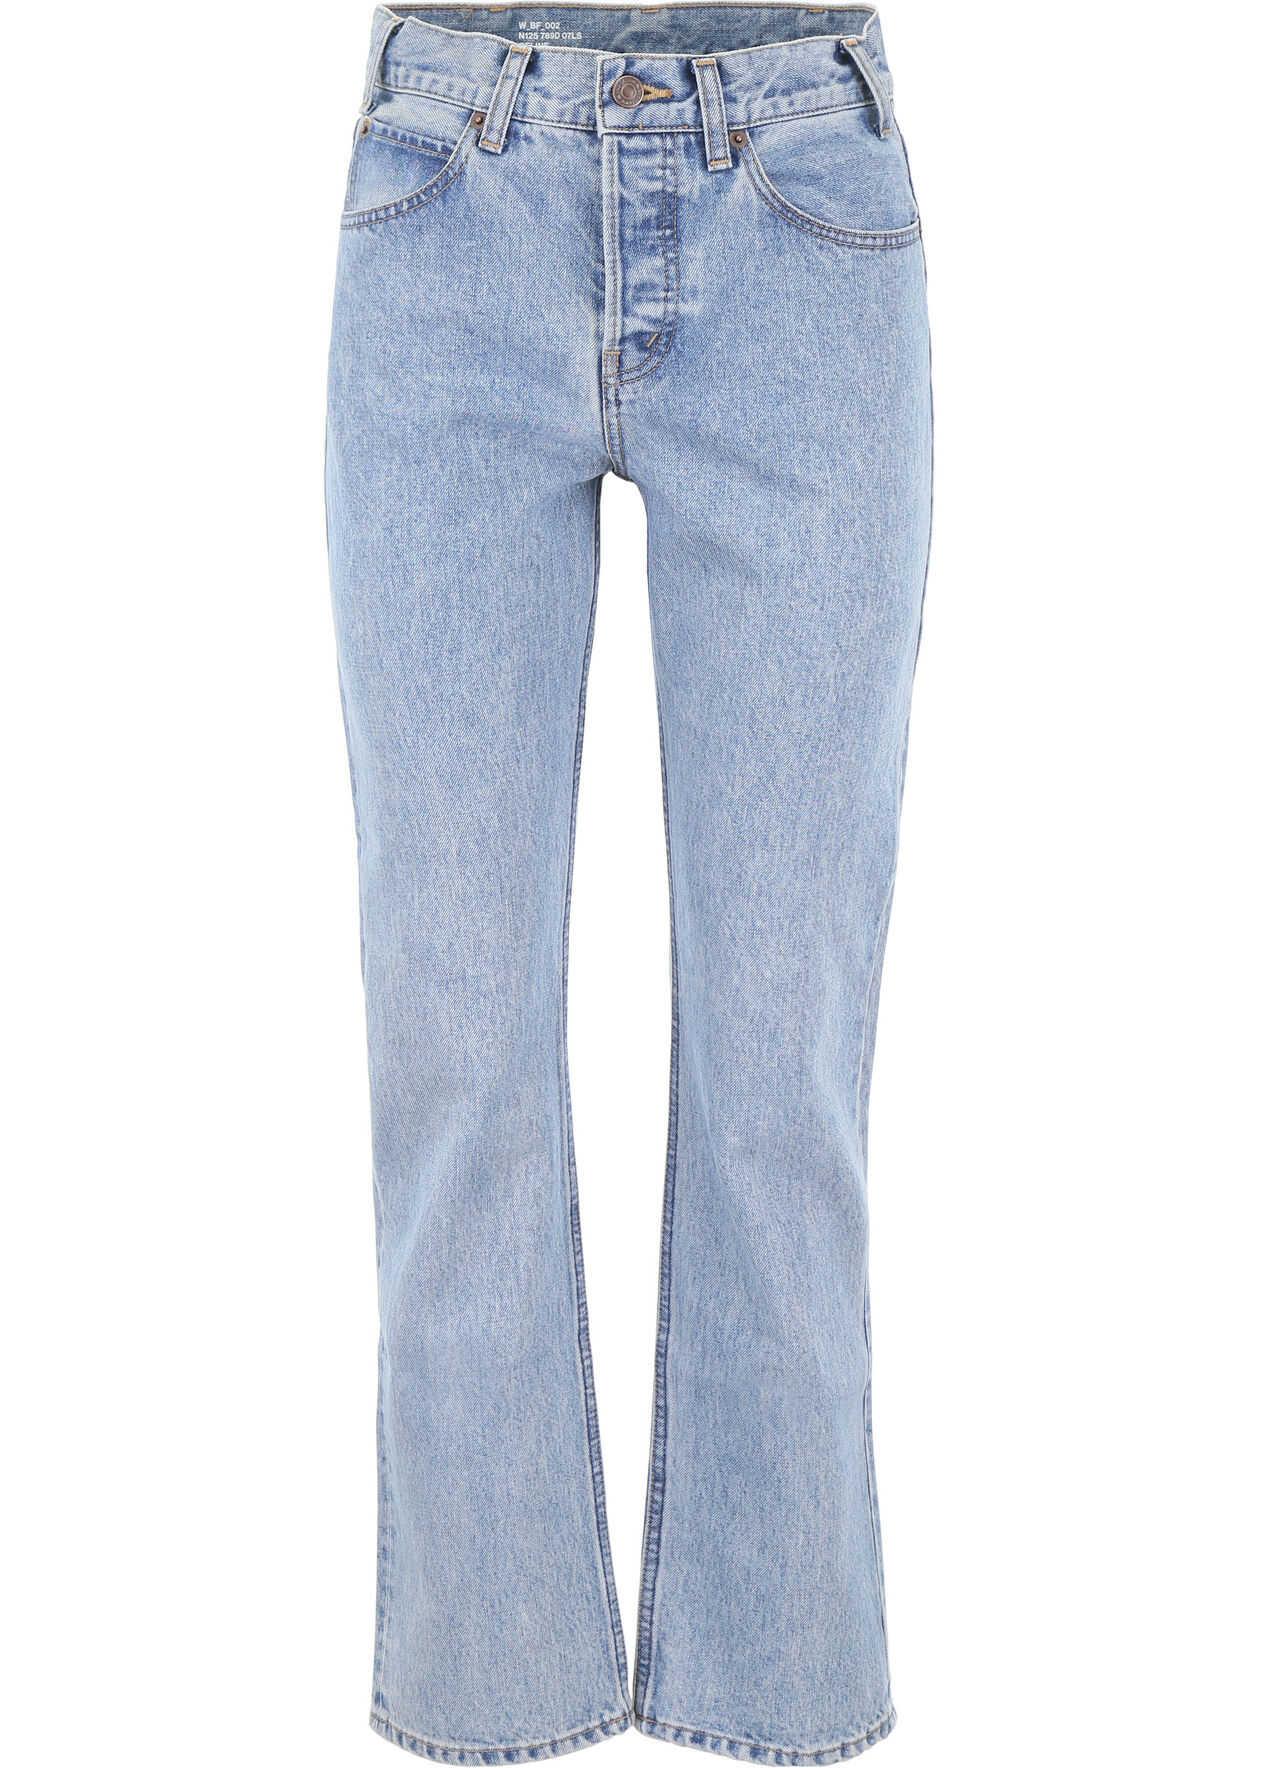 Céline Straight-Leg Jeans INDIGO LIGHT STONE